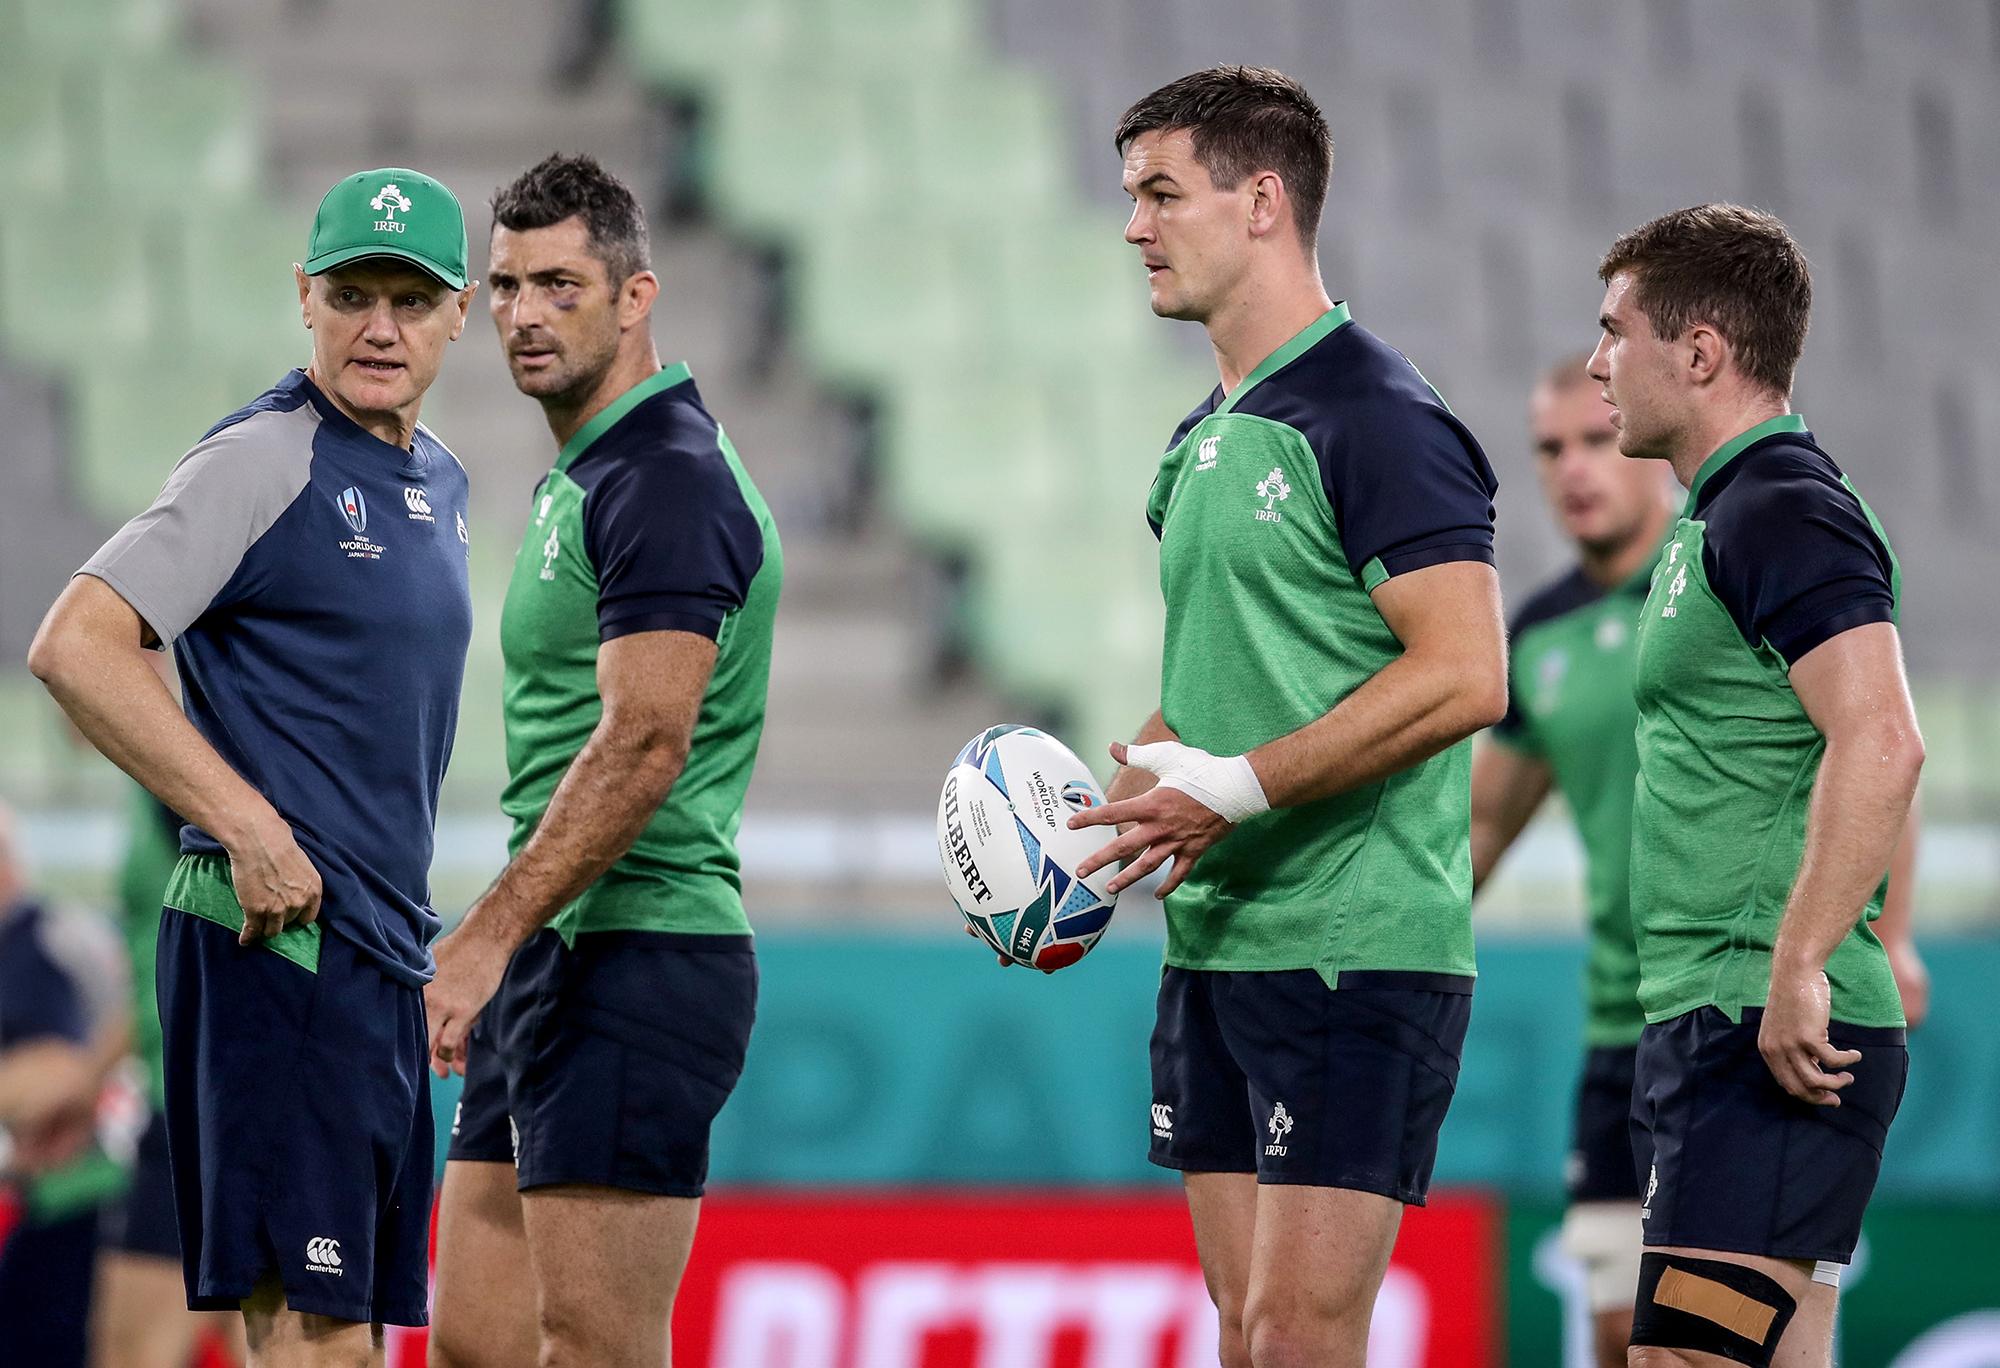 irish rugby match live